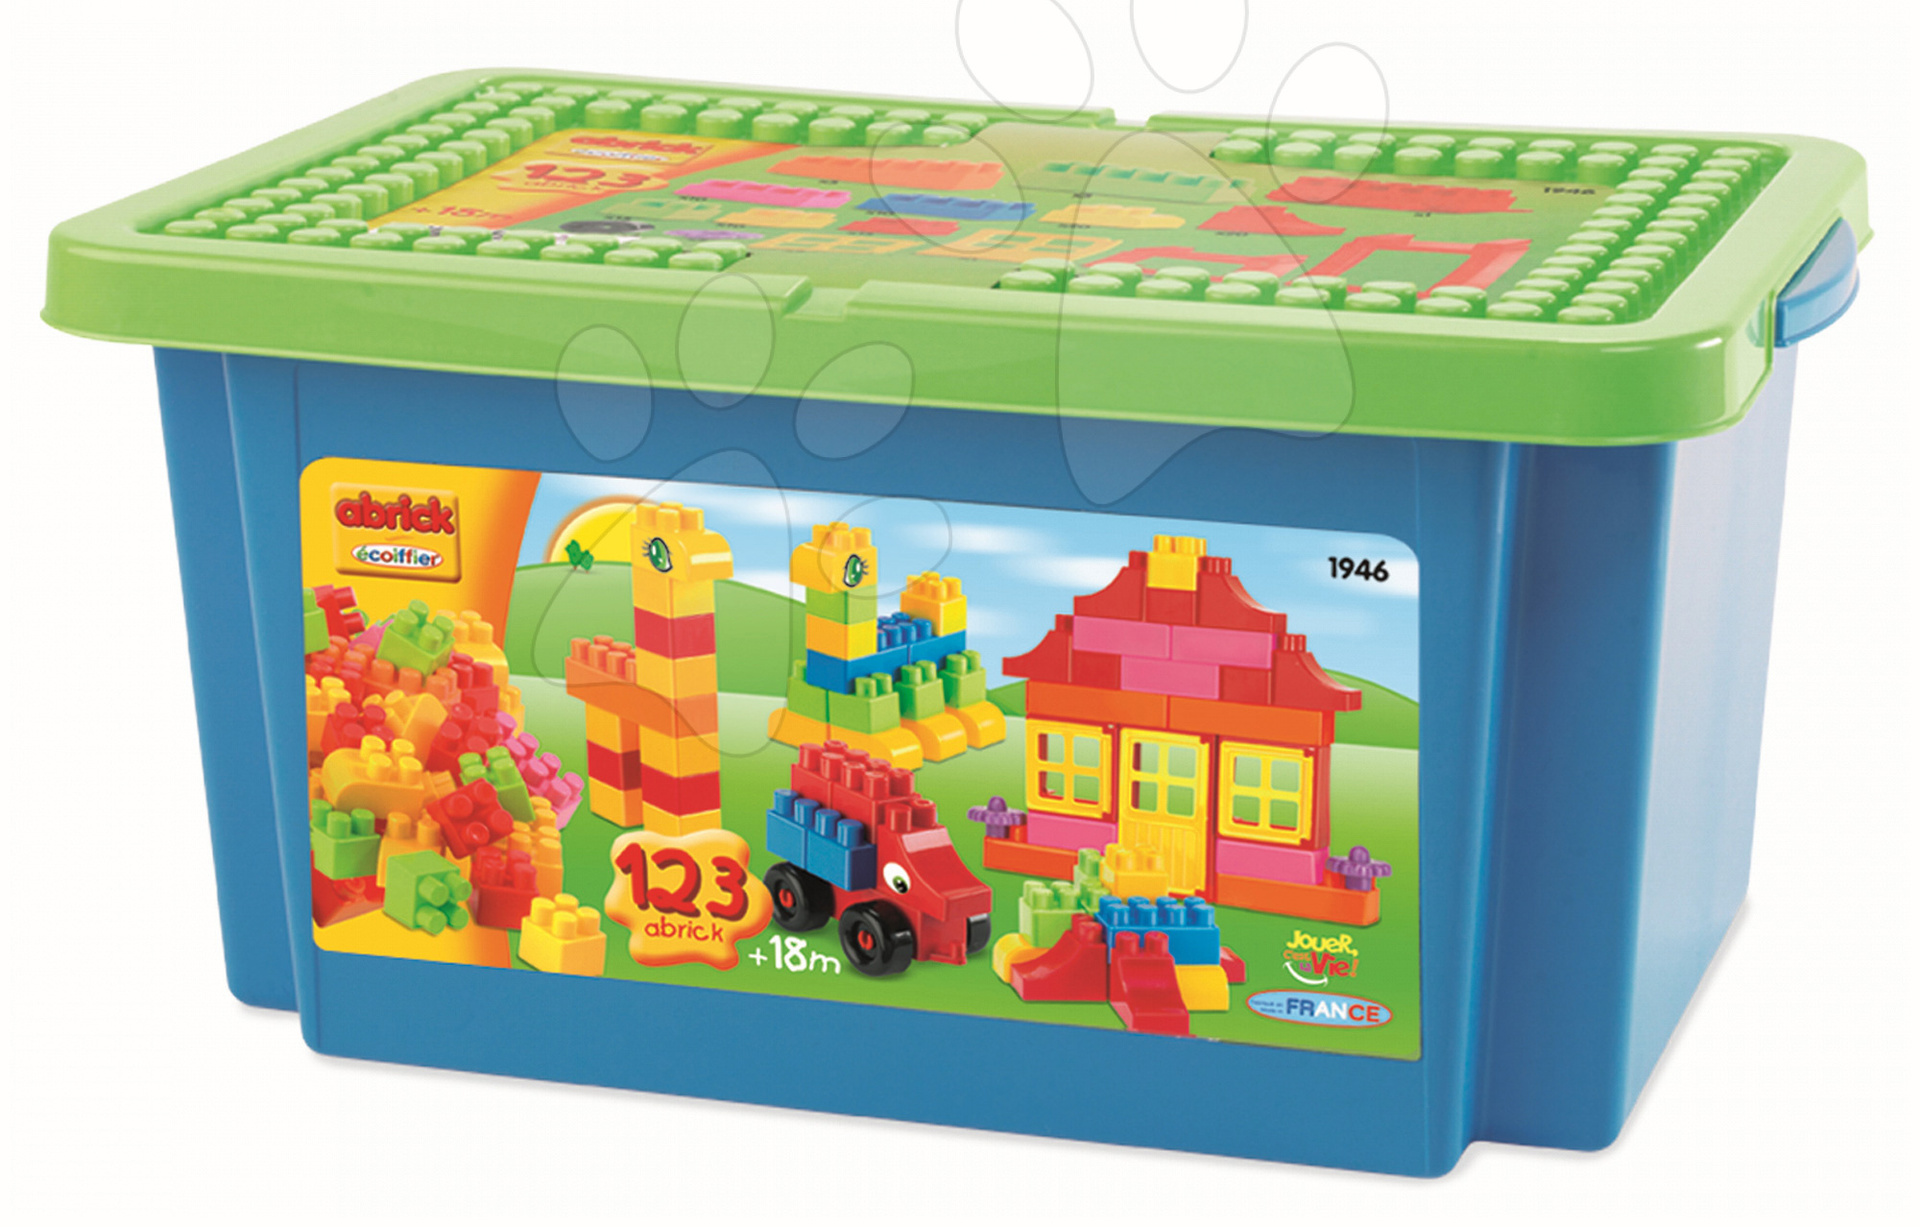 Otroške kocke Abrick - Kocke Abrick Écoiffier v škatli 123 delov od 18 mes